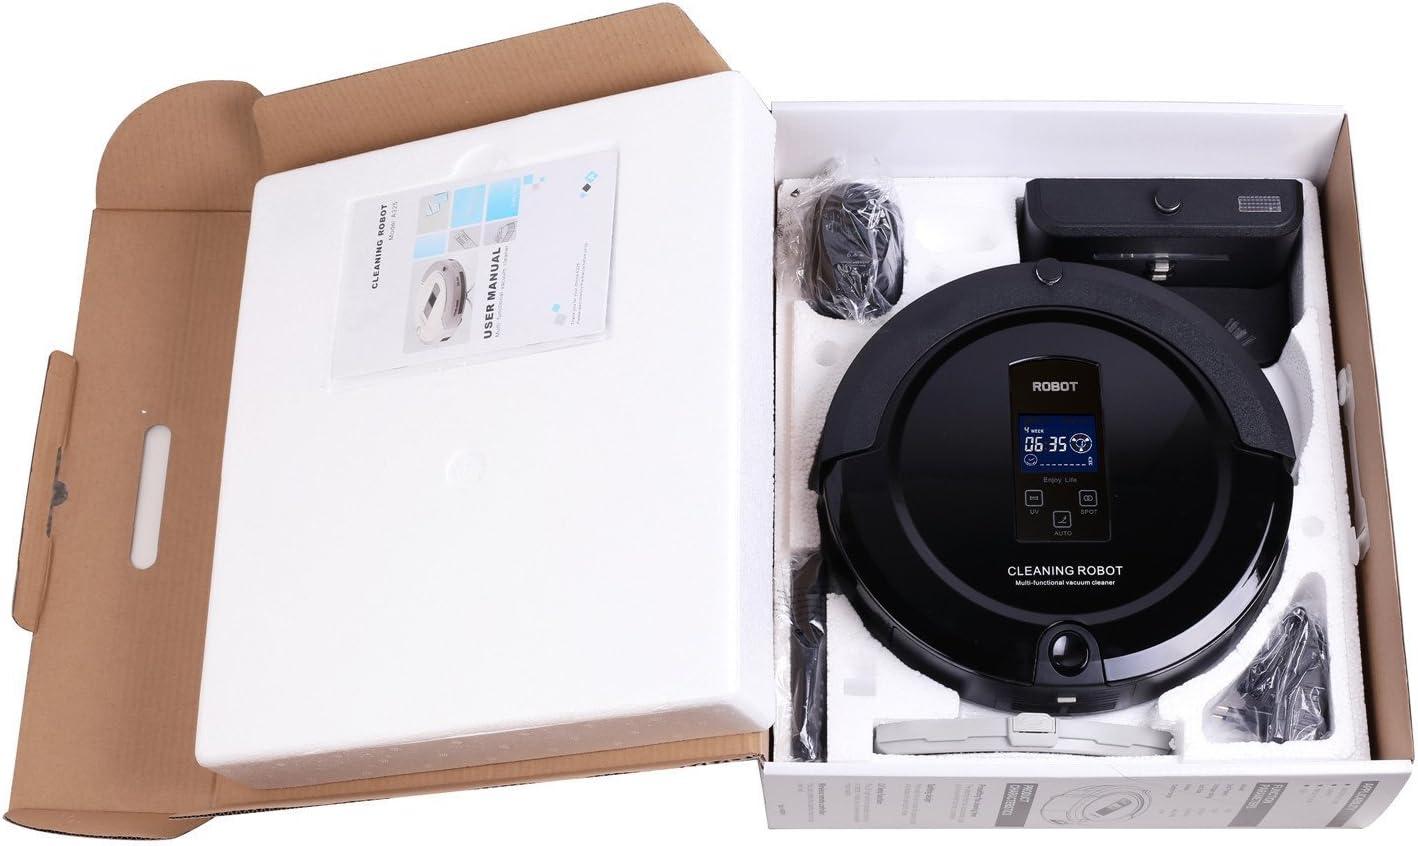 Amtidy Wisdom Robotic A325 - Robot Aspirador, Color Negro Negro: Amazon.es: Hogar